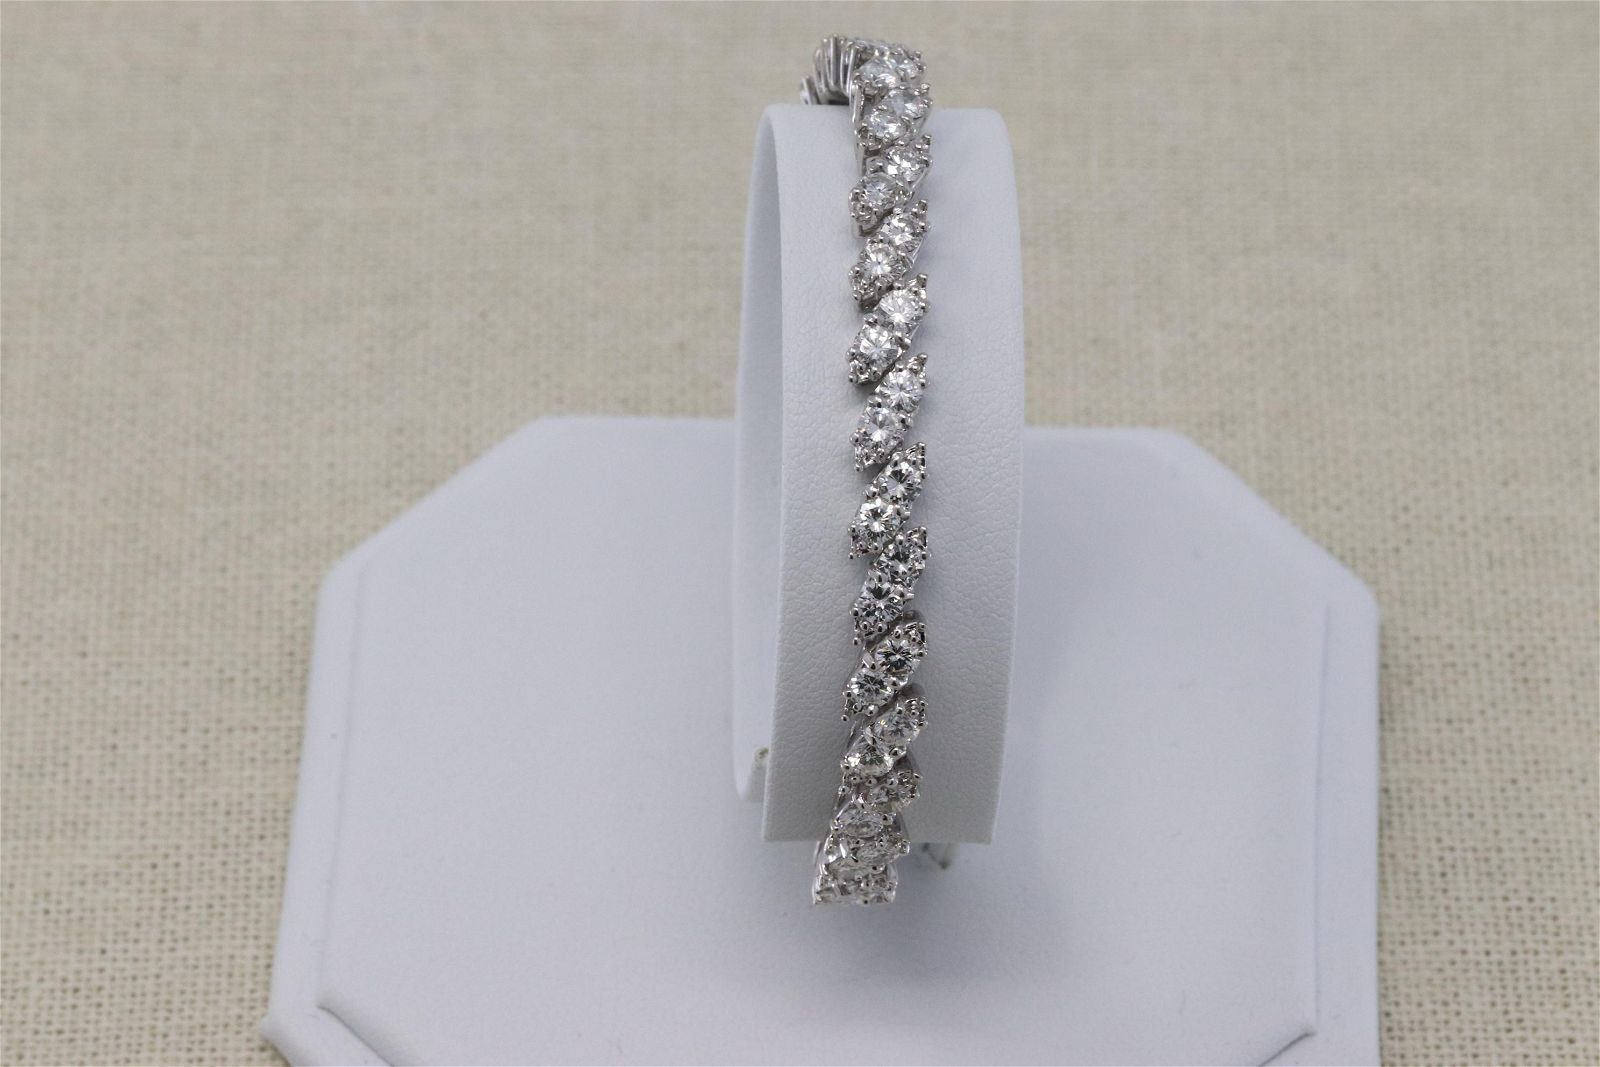 14Kt Art Deco Diamond Bracelet (6.50ctw)